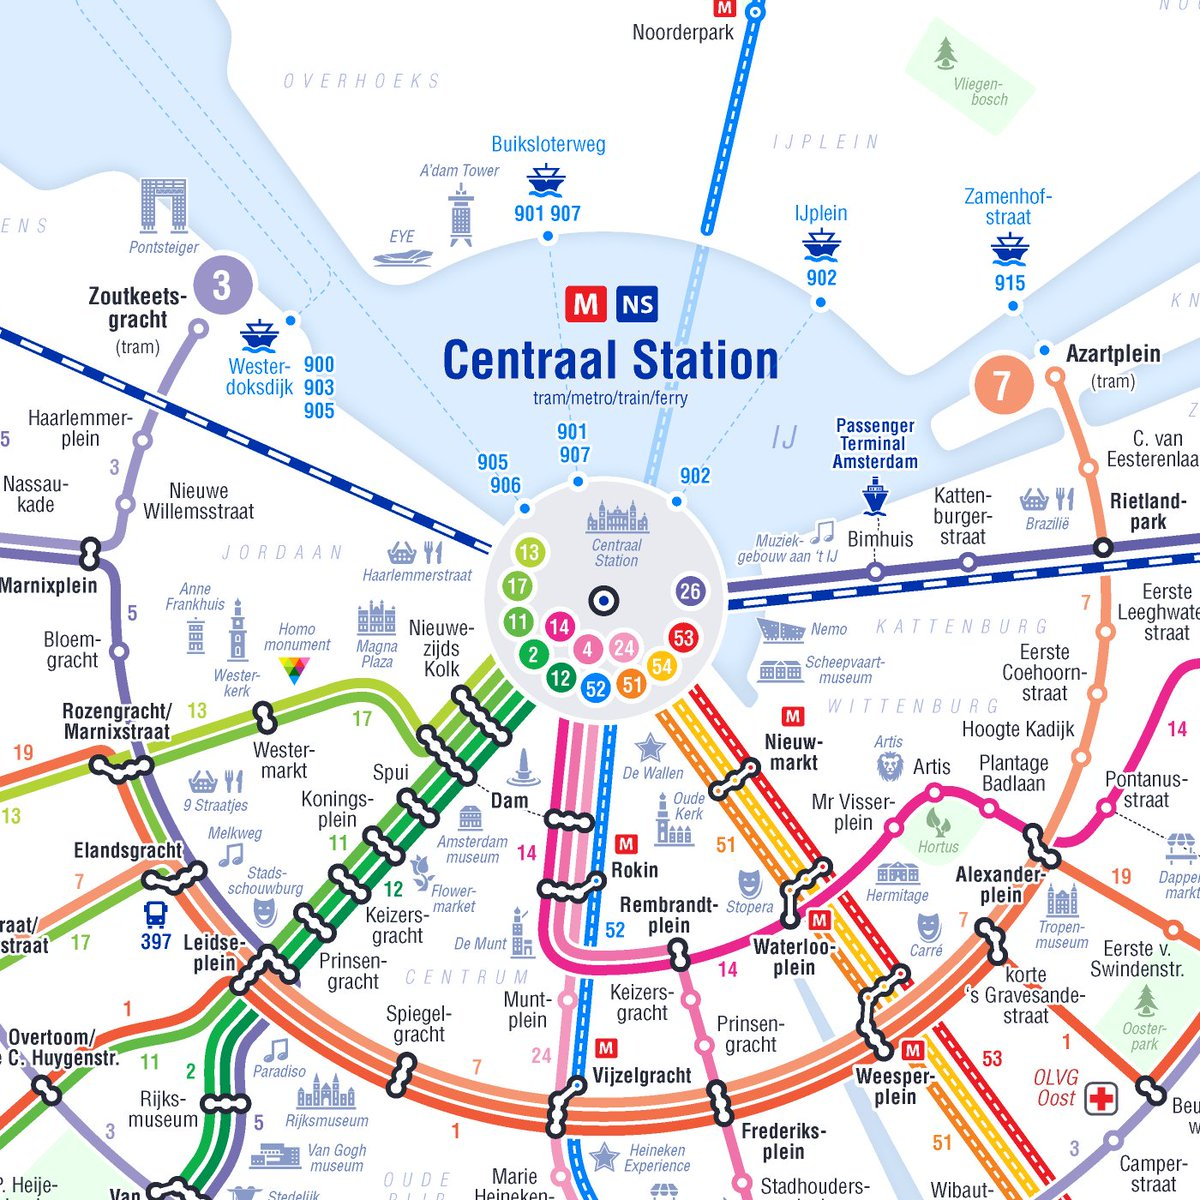 Subway Map Of Amsterdam.Simon Kuestenmacher On Twitter Amsterdam Is Struggling With